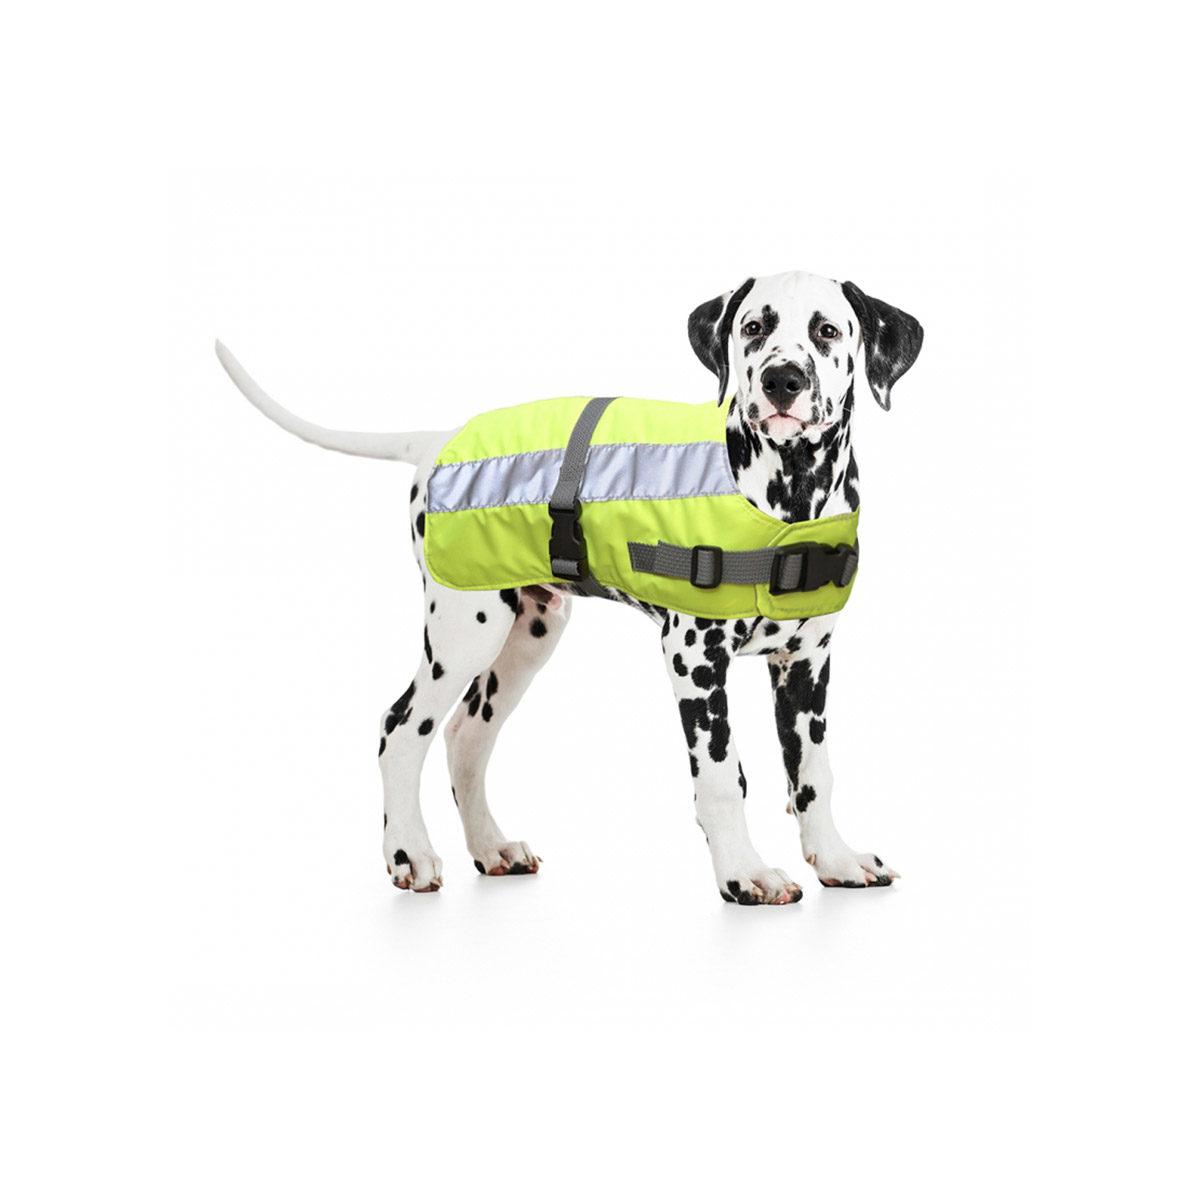 Duvo+ Flectalon Hi Vis Honden Jack Ruglengte 45 cm Geel - in Reflectie & Verlichting